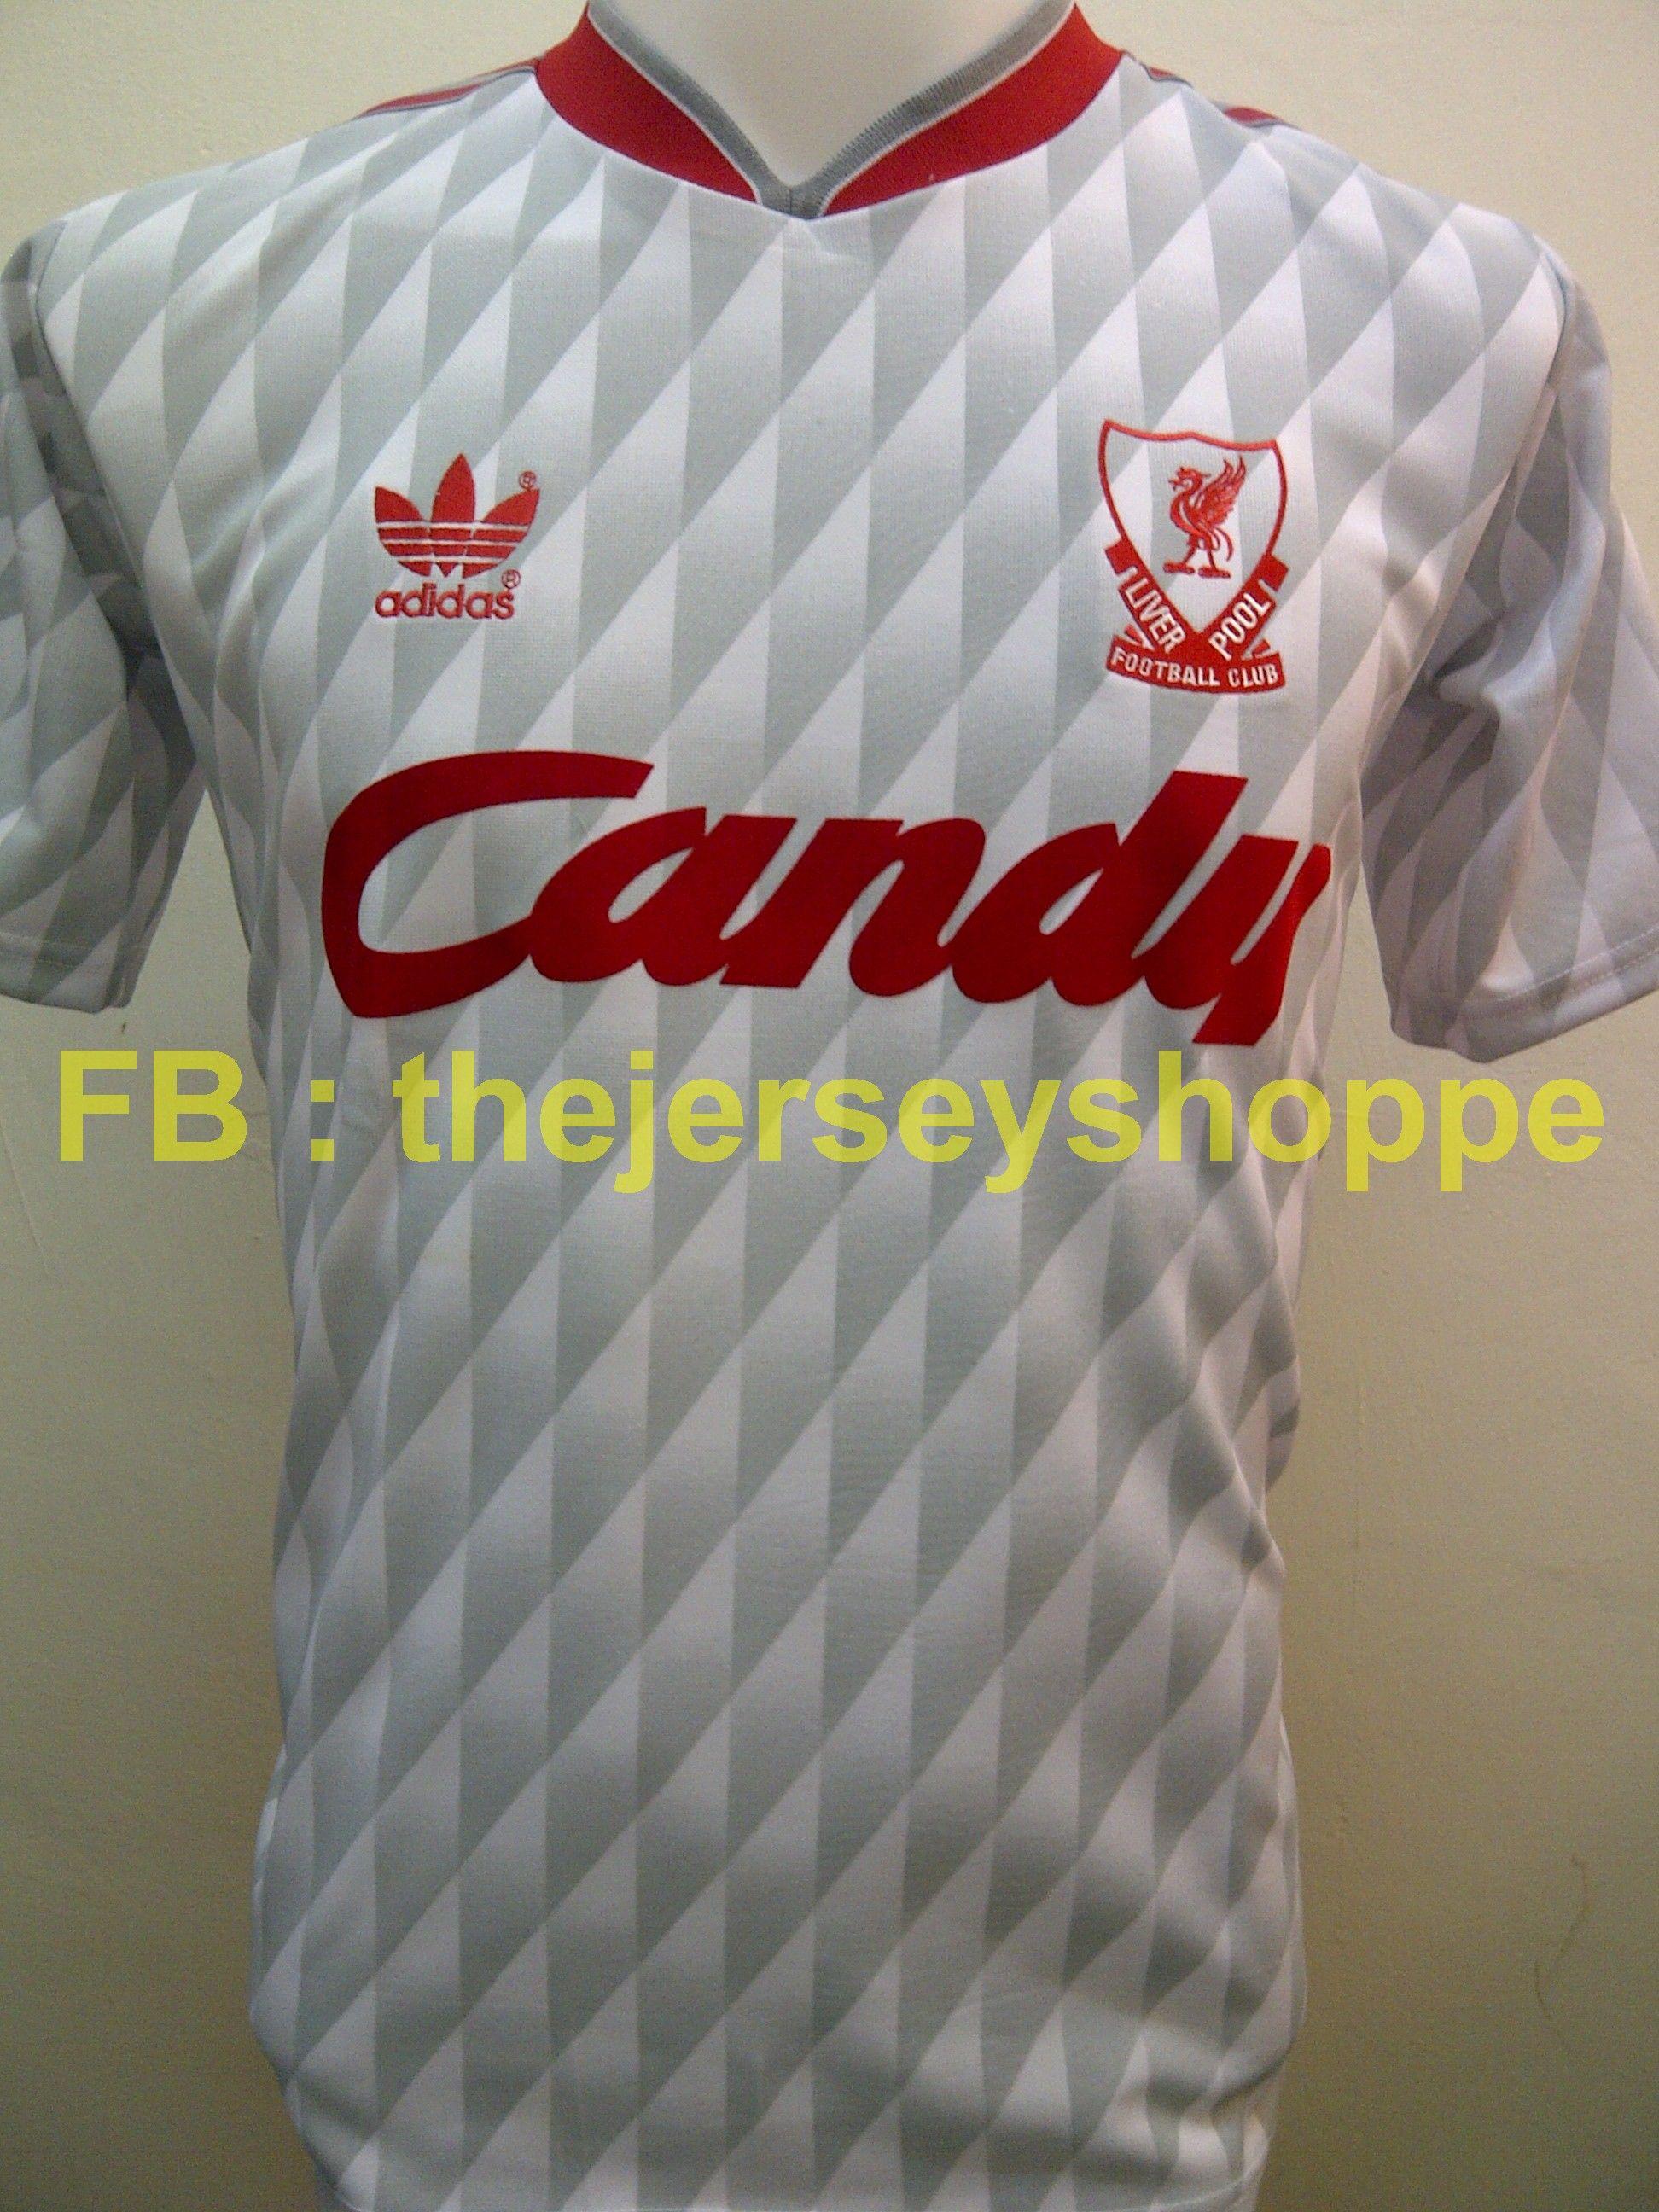 Liverpool 1990 Away Diamond Grey Vintage Jersey Conditon New Replica Fabric 100 Polyester Grade Aa Vintage Football Shirts Vintage Jerseys Jersey Sweater